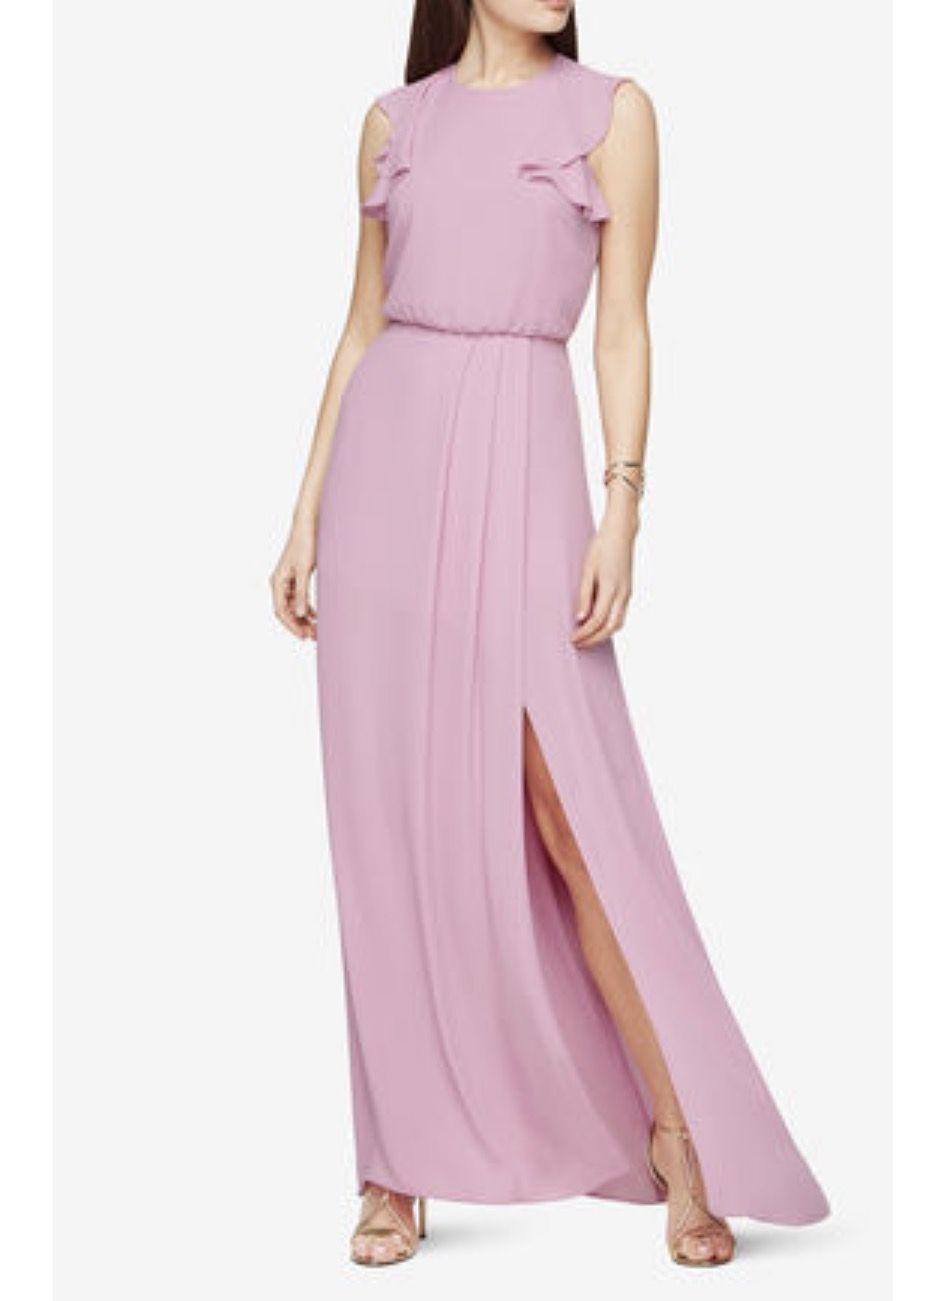 Pin de Jen Mora en Bridesmaid Dresses - References | Pinterest